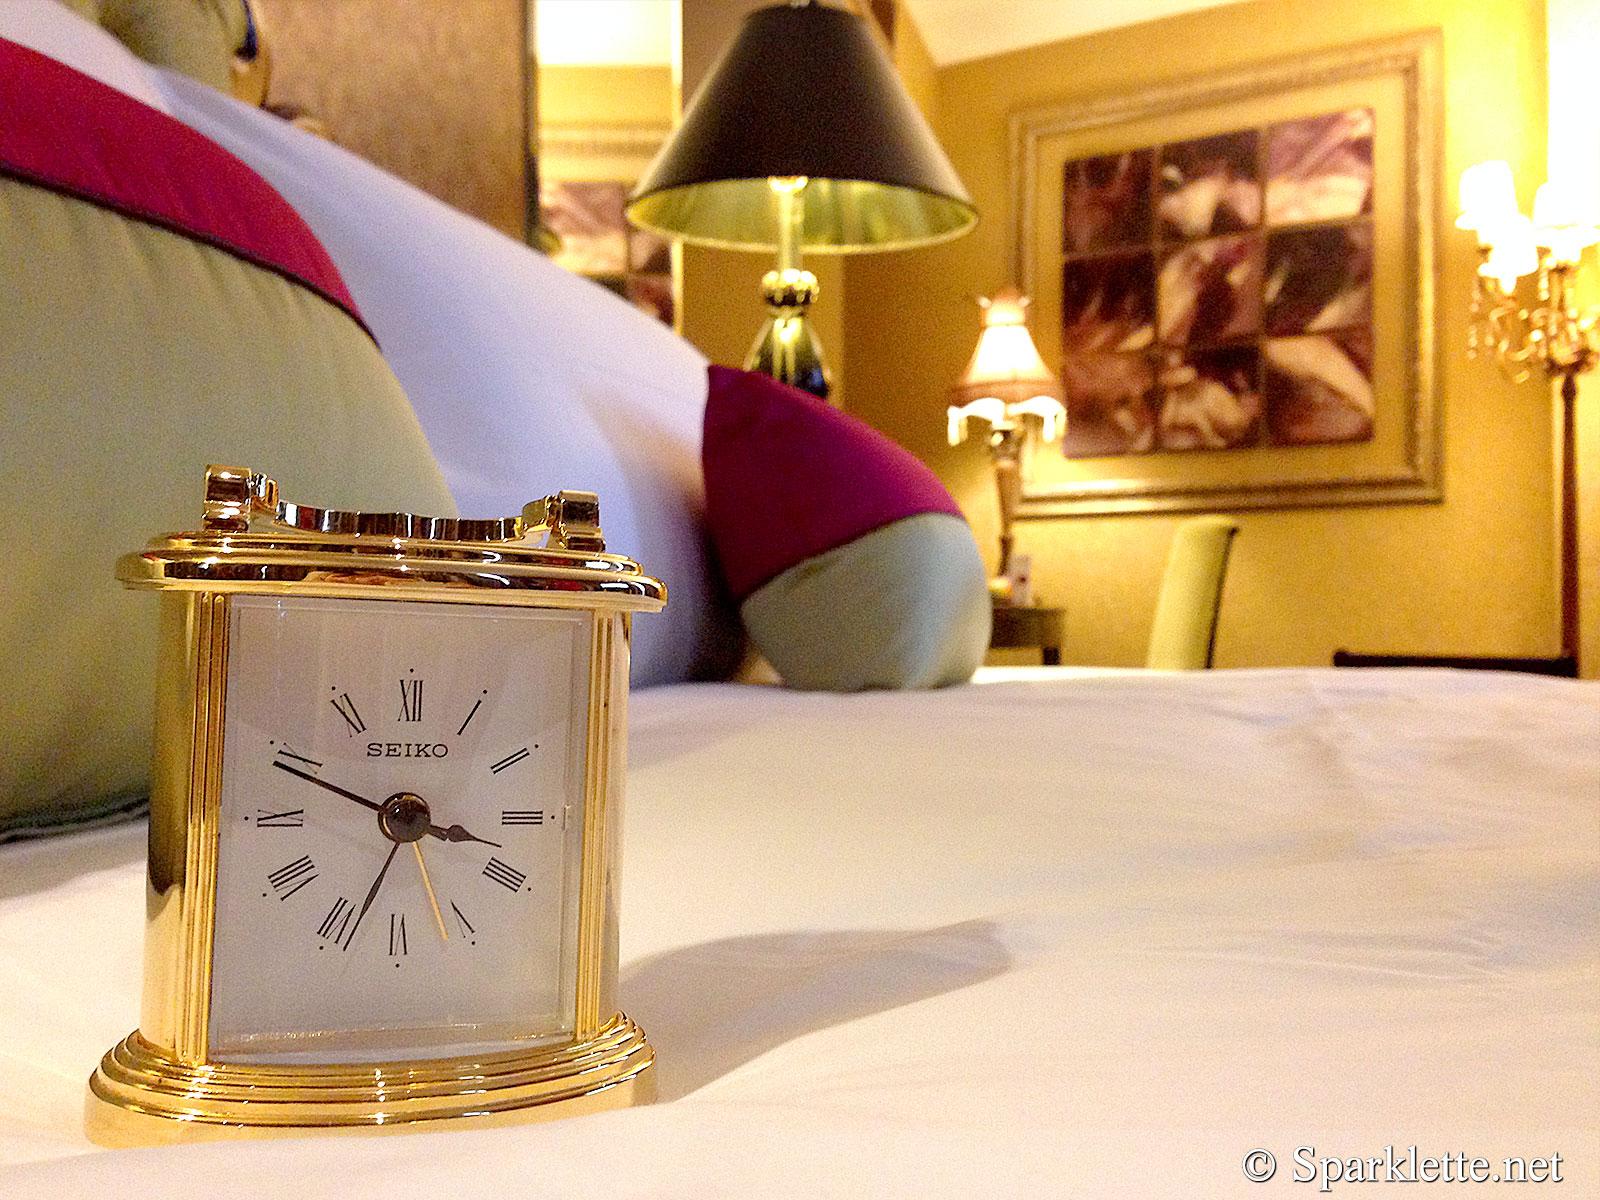 The Scarlet Hotel Splendour Suite Clock